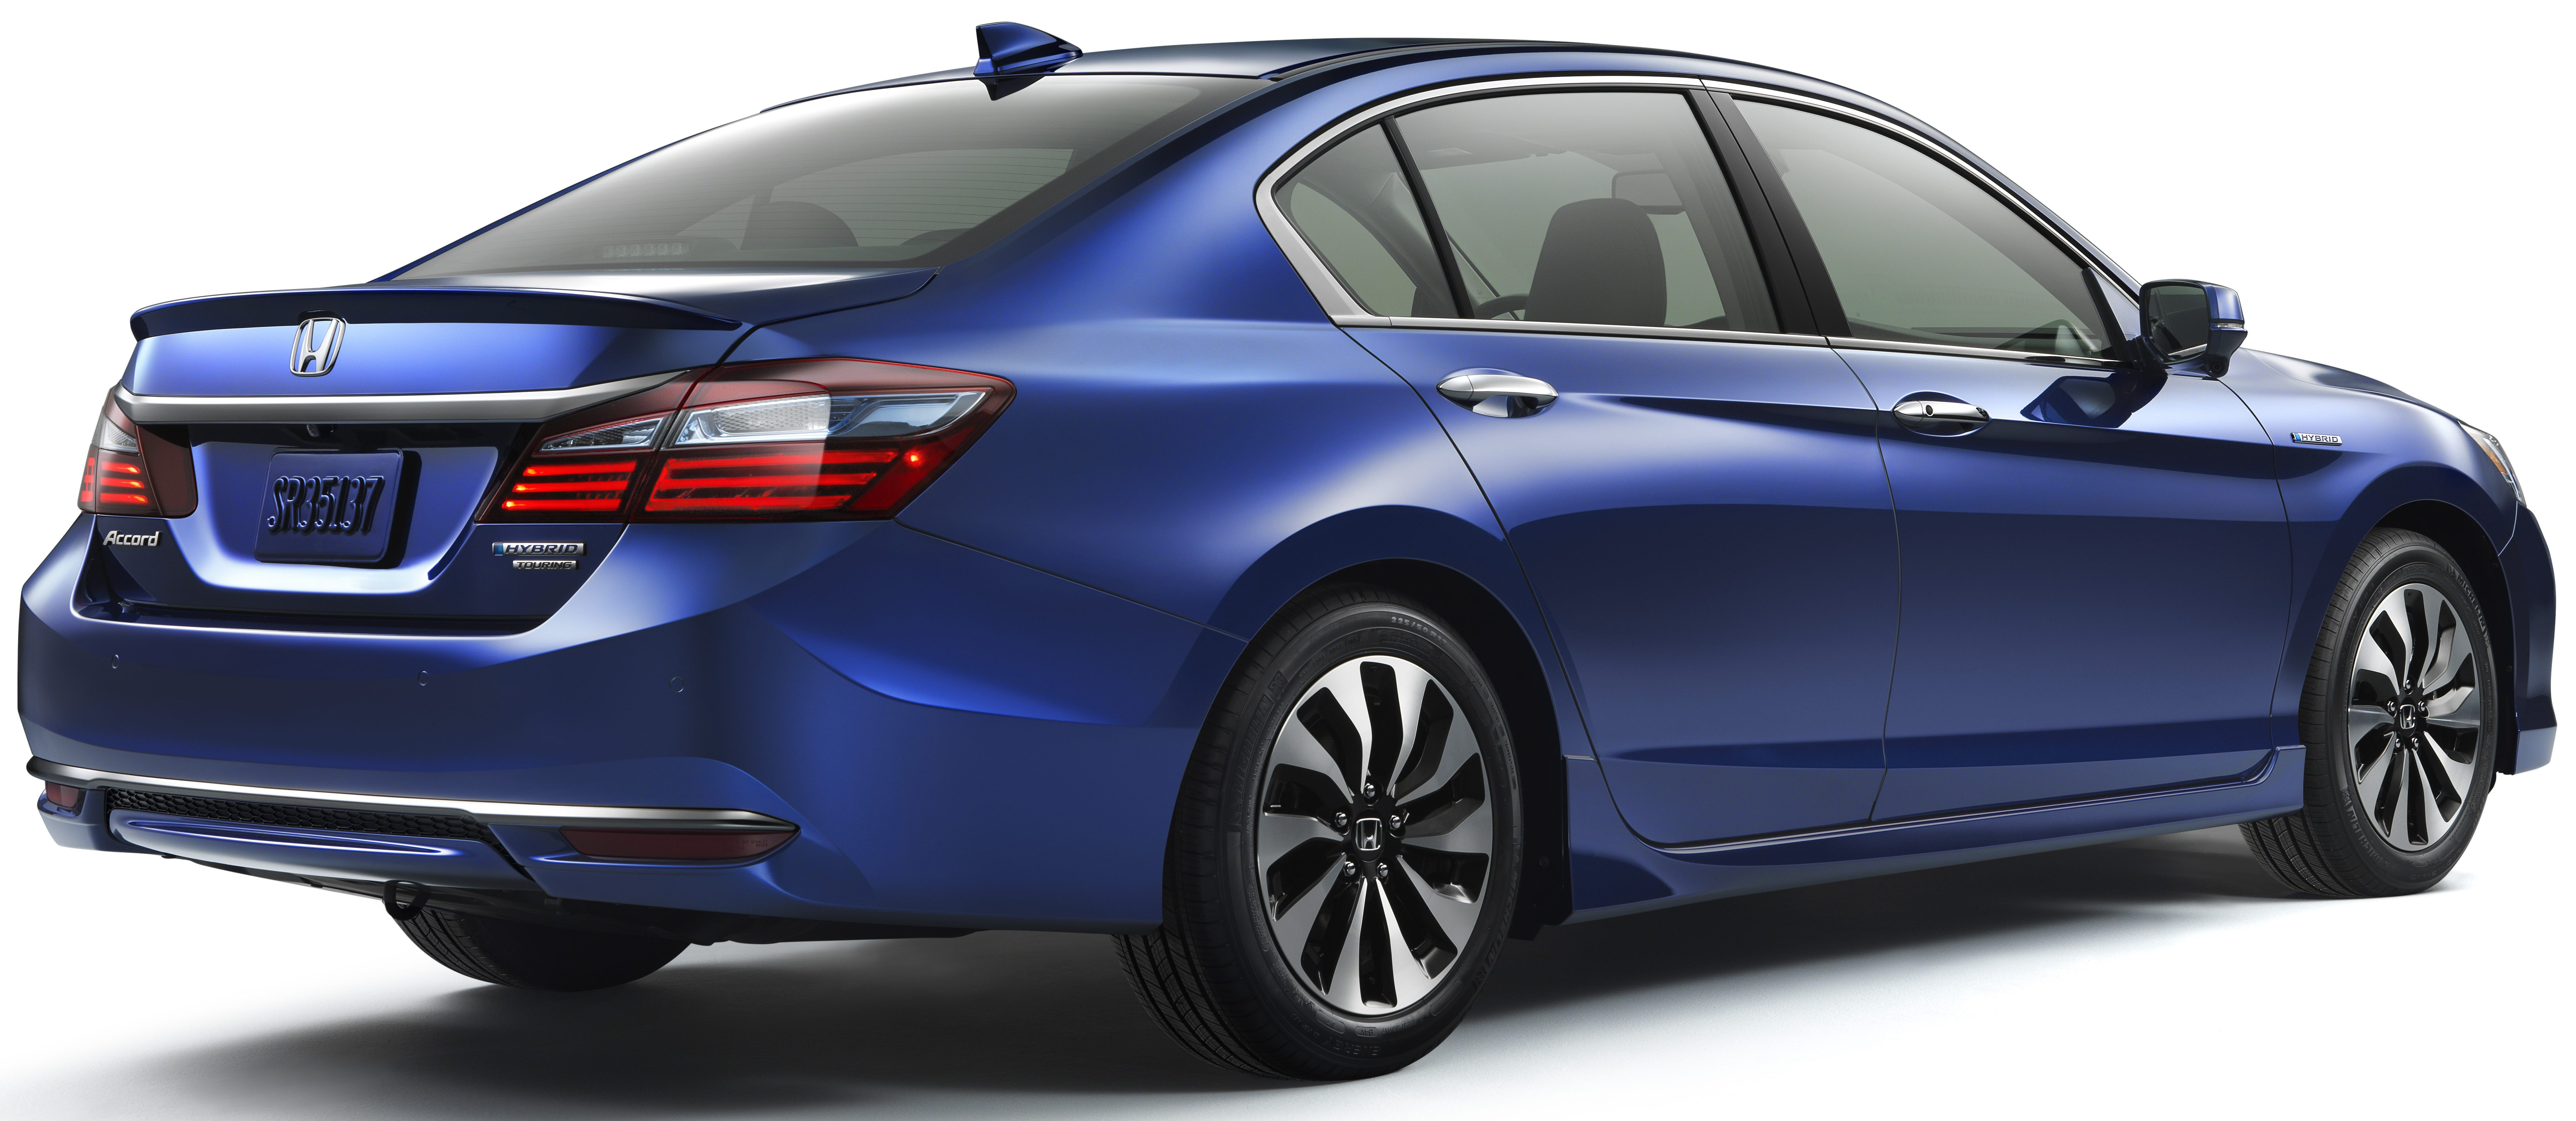 Honda >> 2017 Honda Accord Hybrid revealed – up to 20.4 km/l Paul Tan - Image 481723